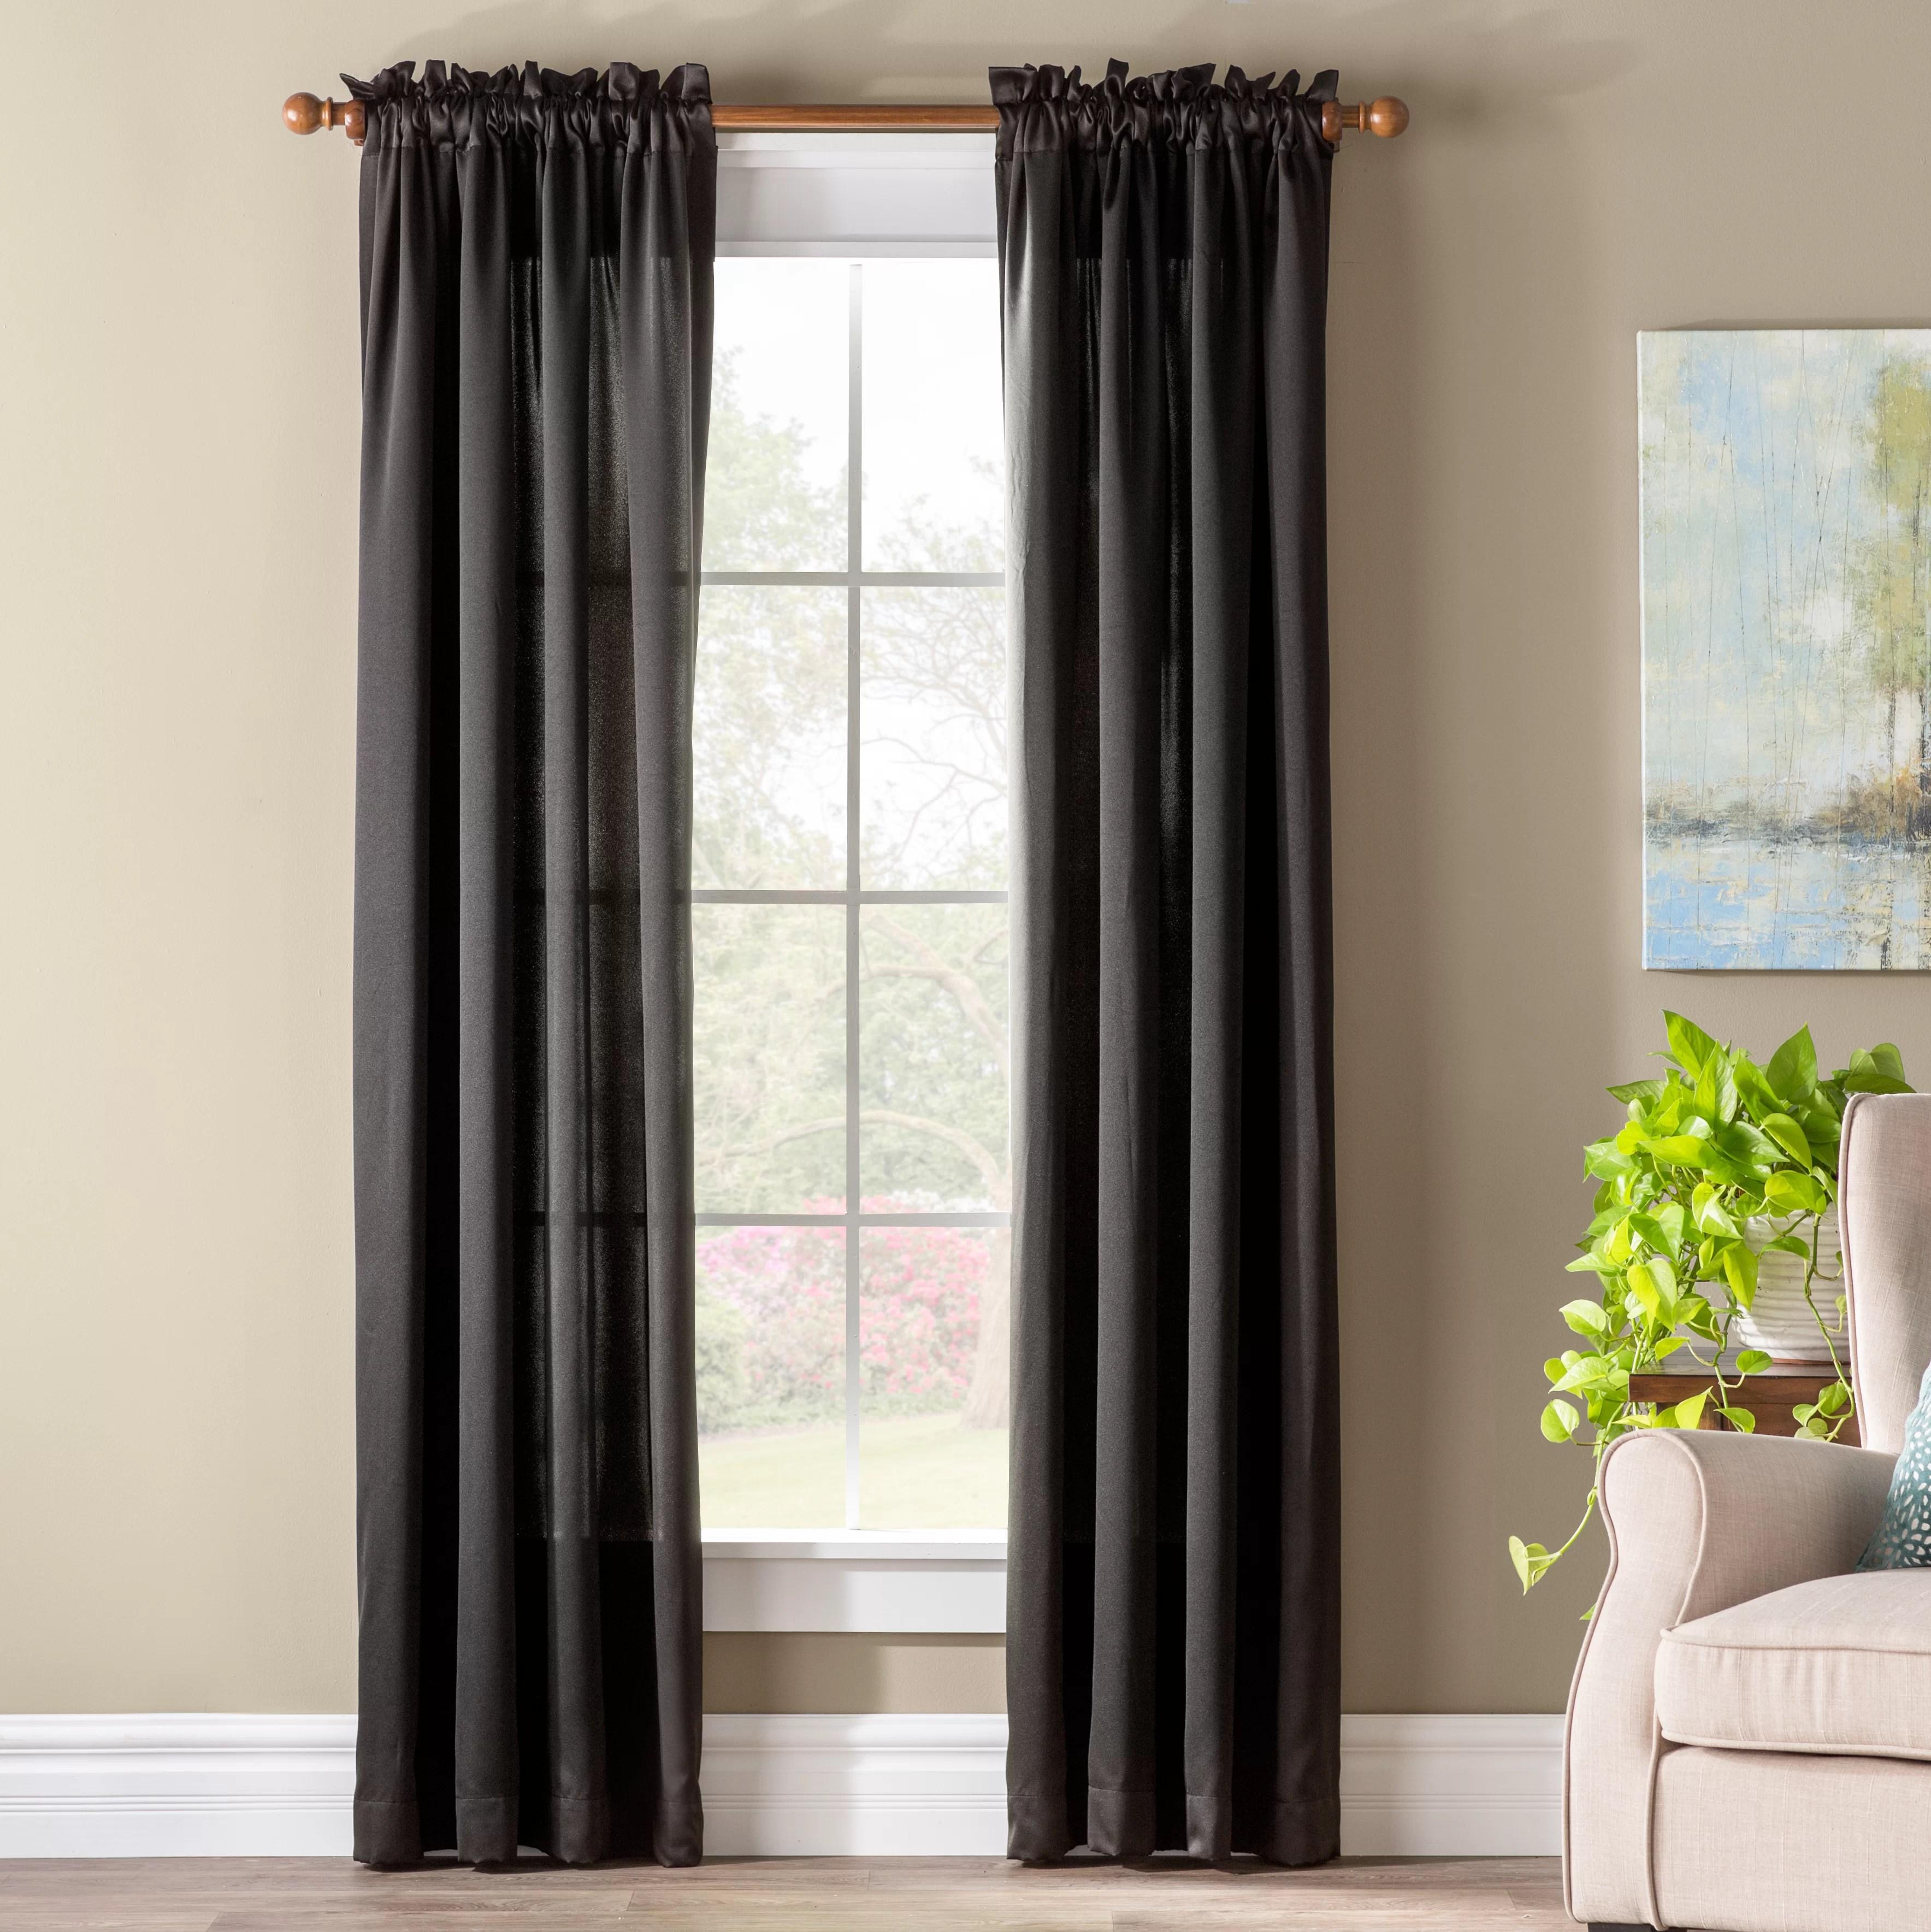 bohemian curtains drapes free